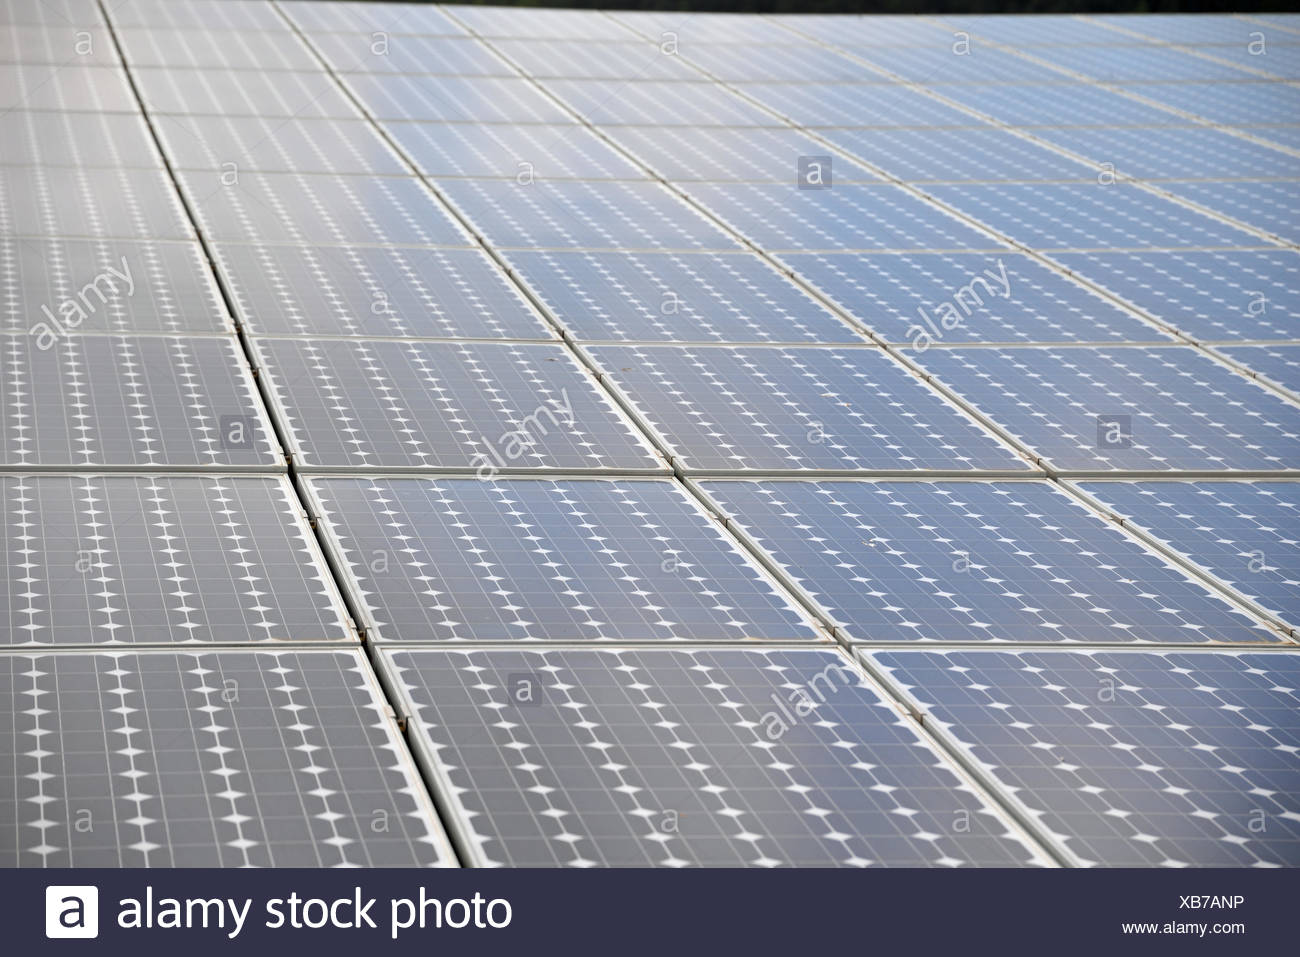 Solarzellen Solarzelle Dach Solaranlage Solarenergie